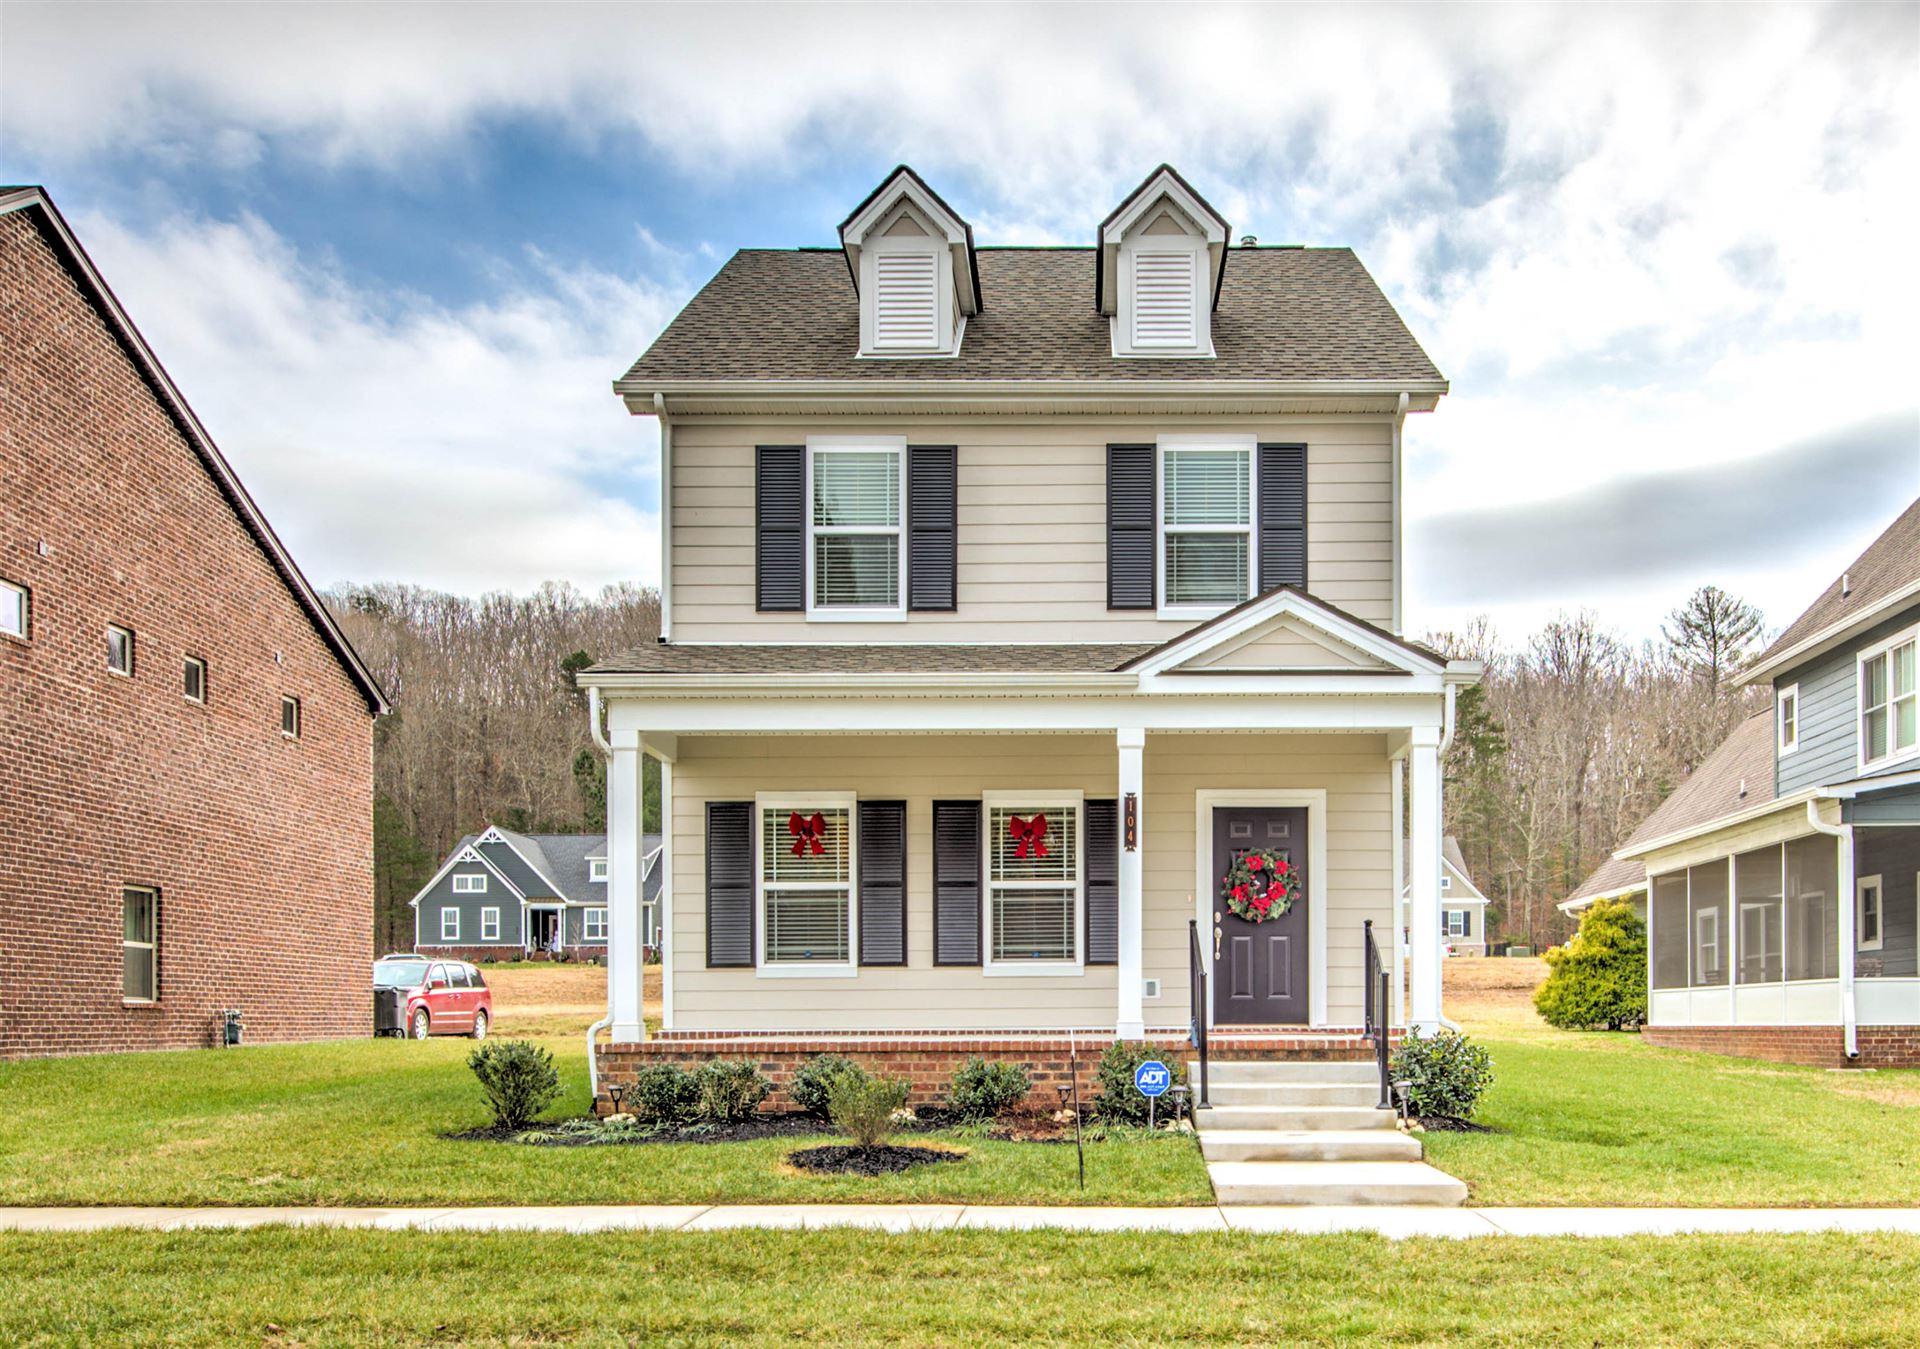 Photo of 104 Curie Lane, Oak Ridge, TN 37830 (MLS # 1138791)